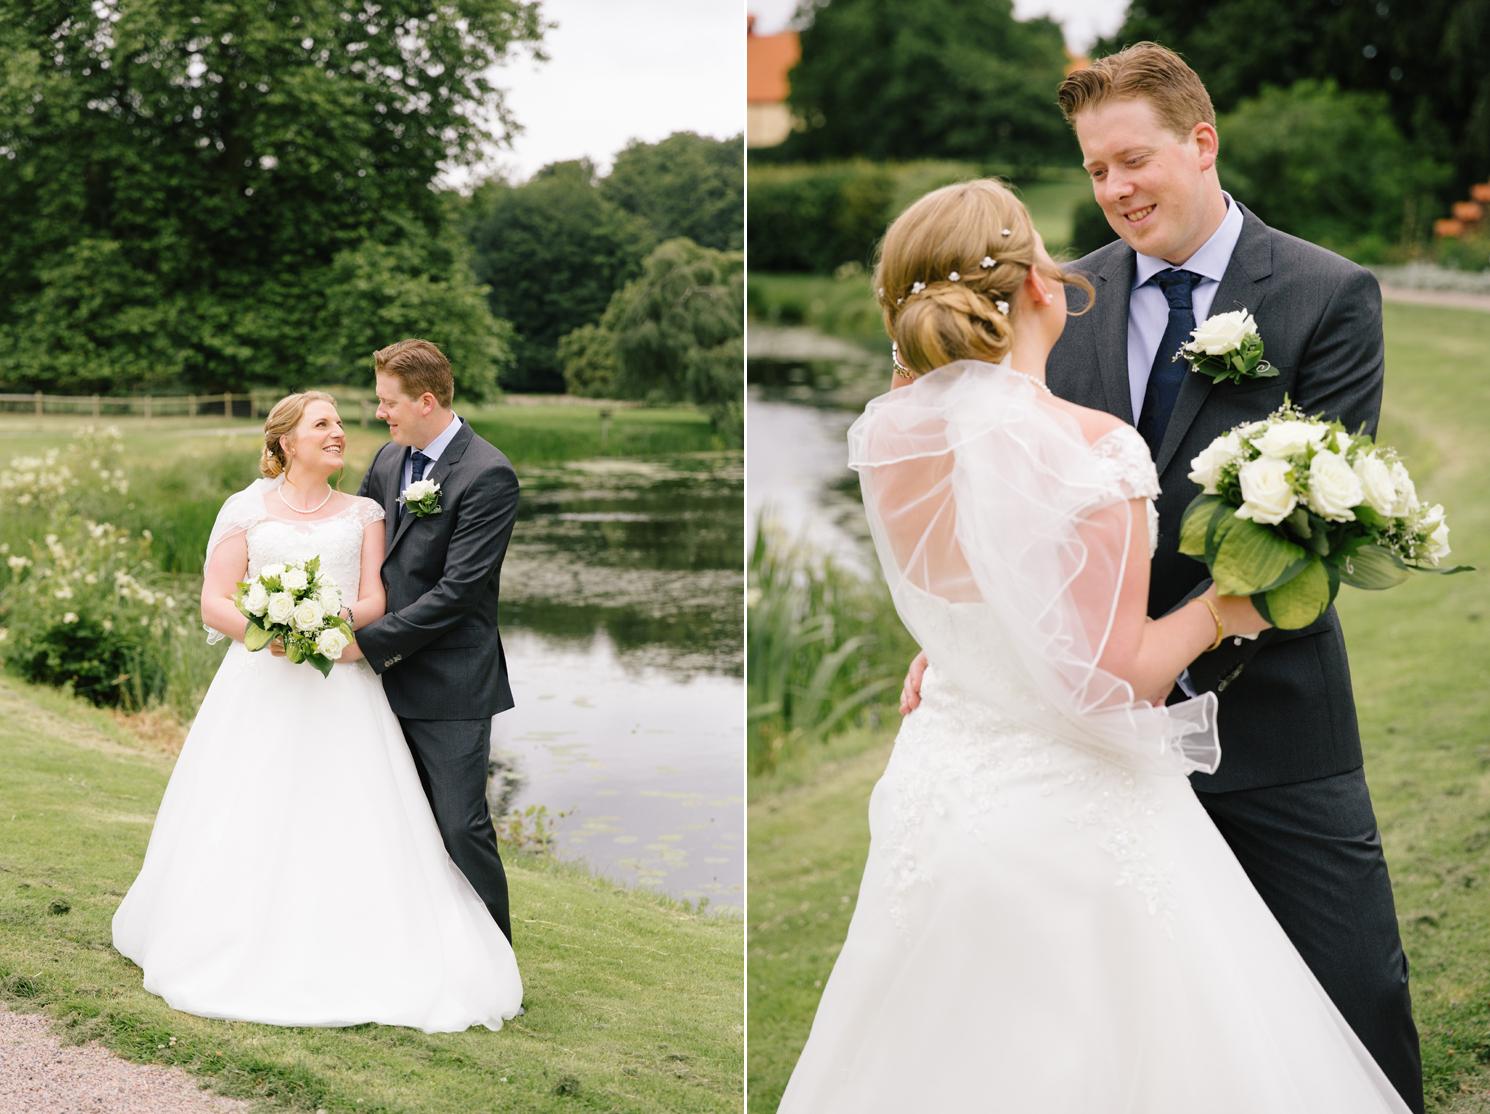 brollopsfotografering,-Torups-slott,-lek,-gladje,-karlek,-Maria-O-Photo-2